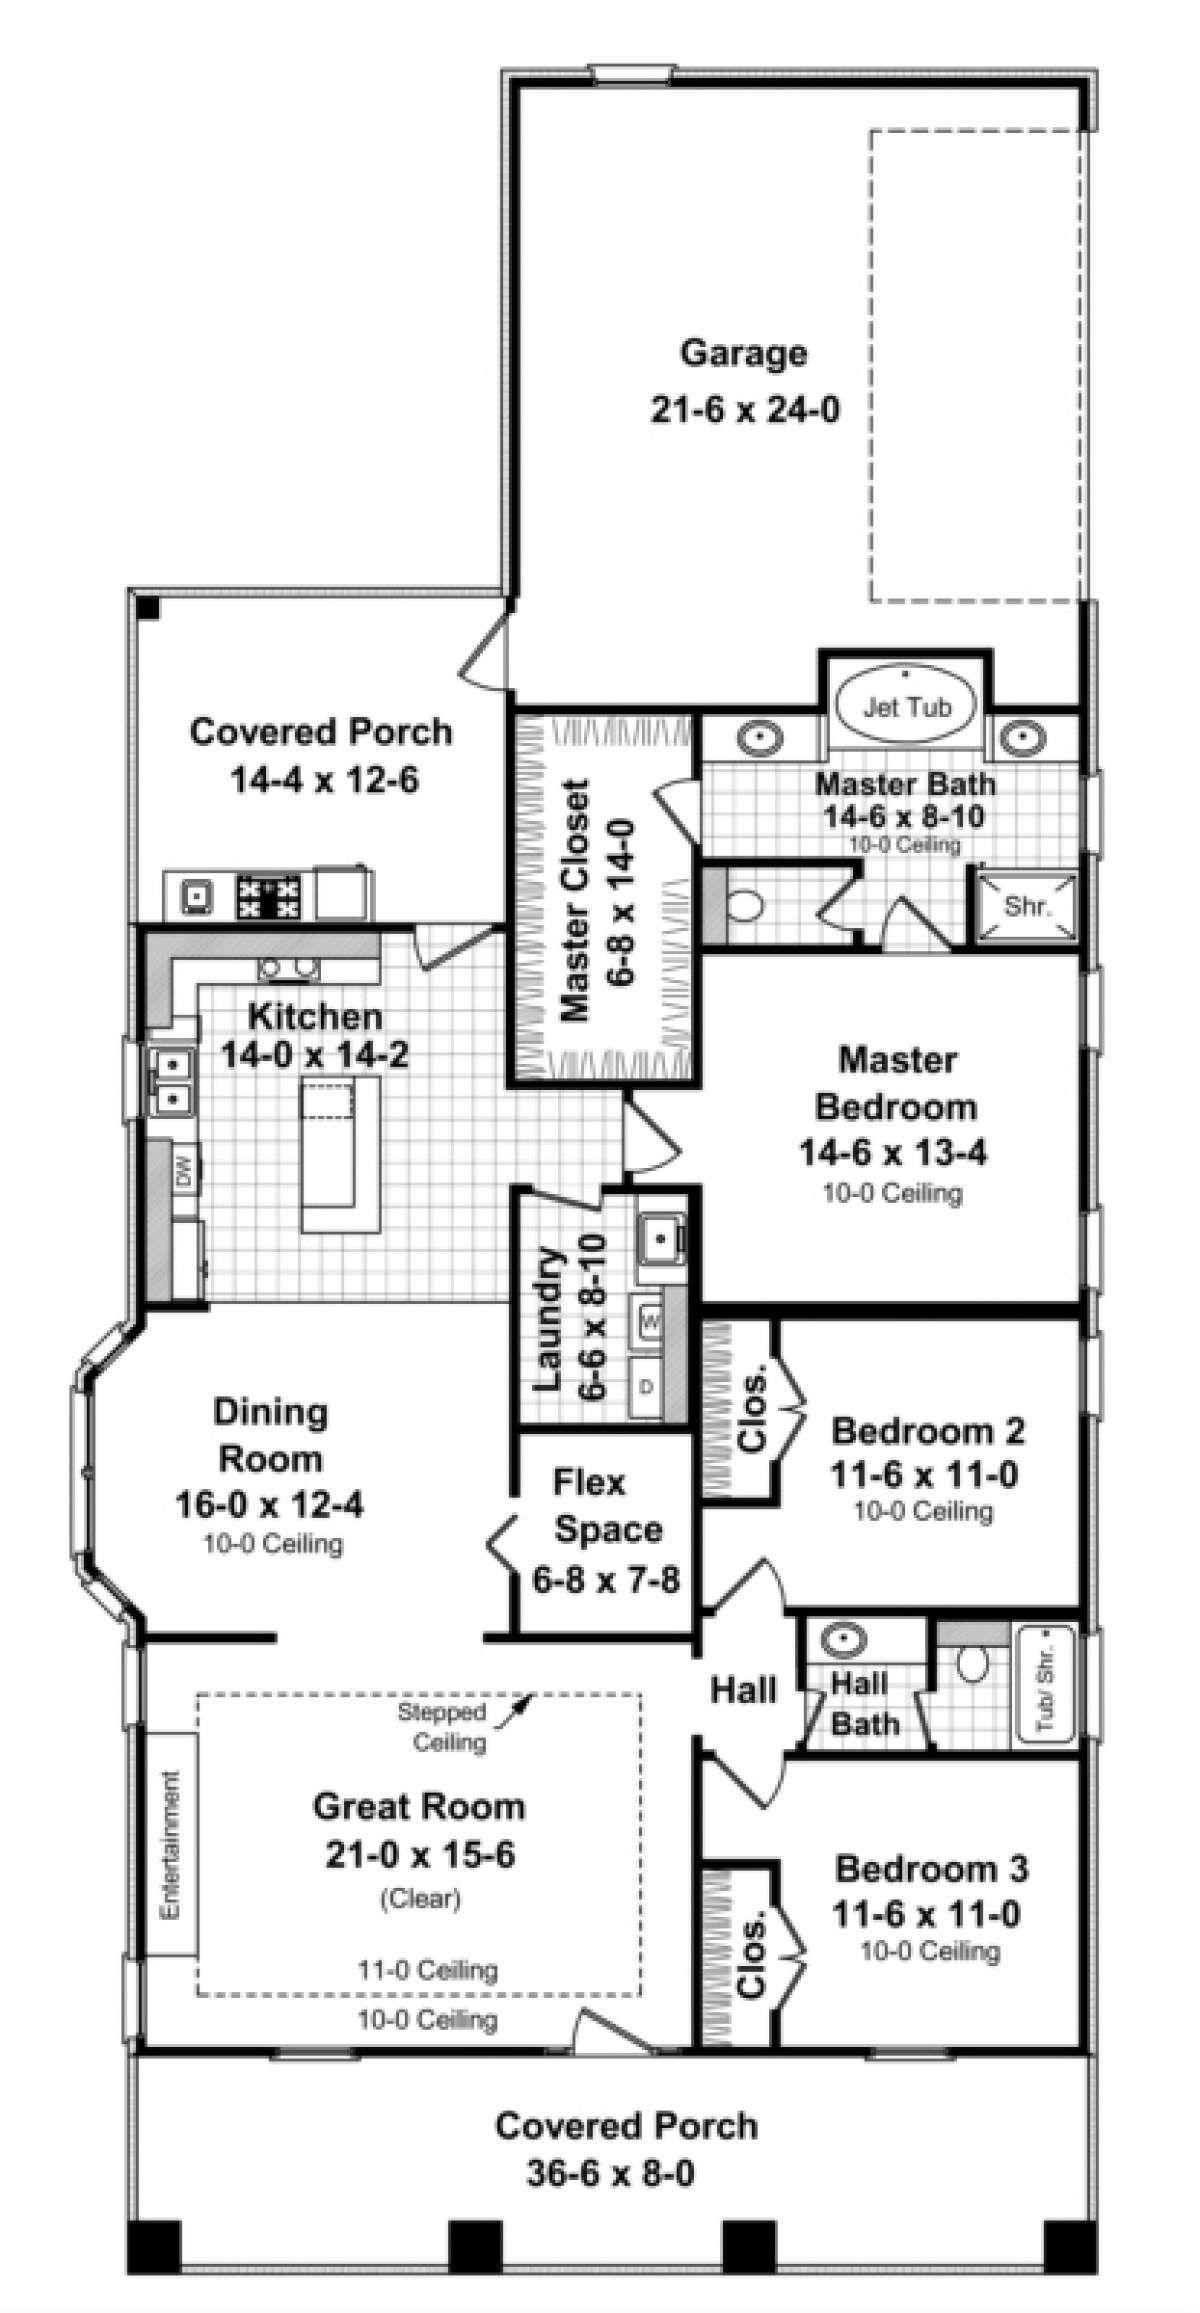 House Plan 348 00064 Cottage Plan 1 800 Square Feet 3